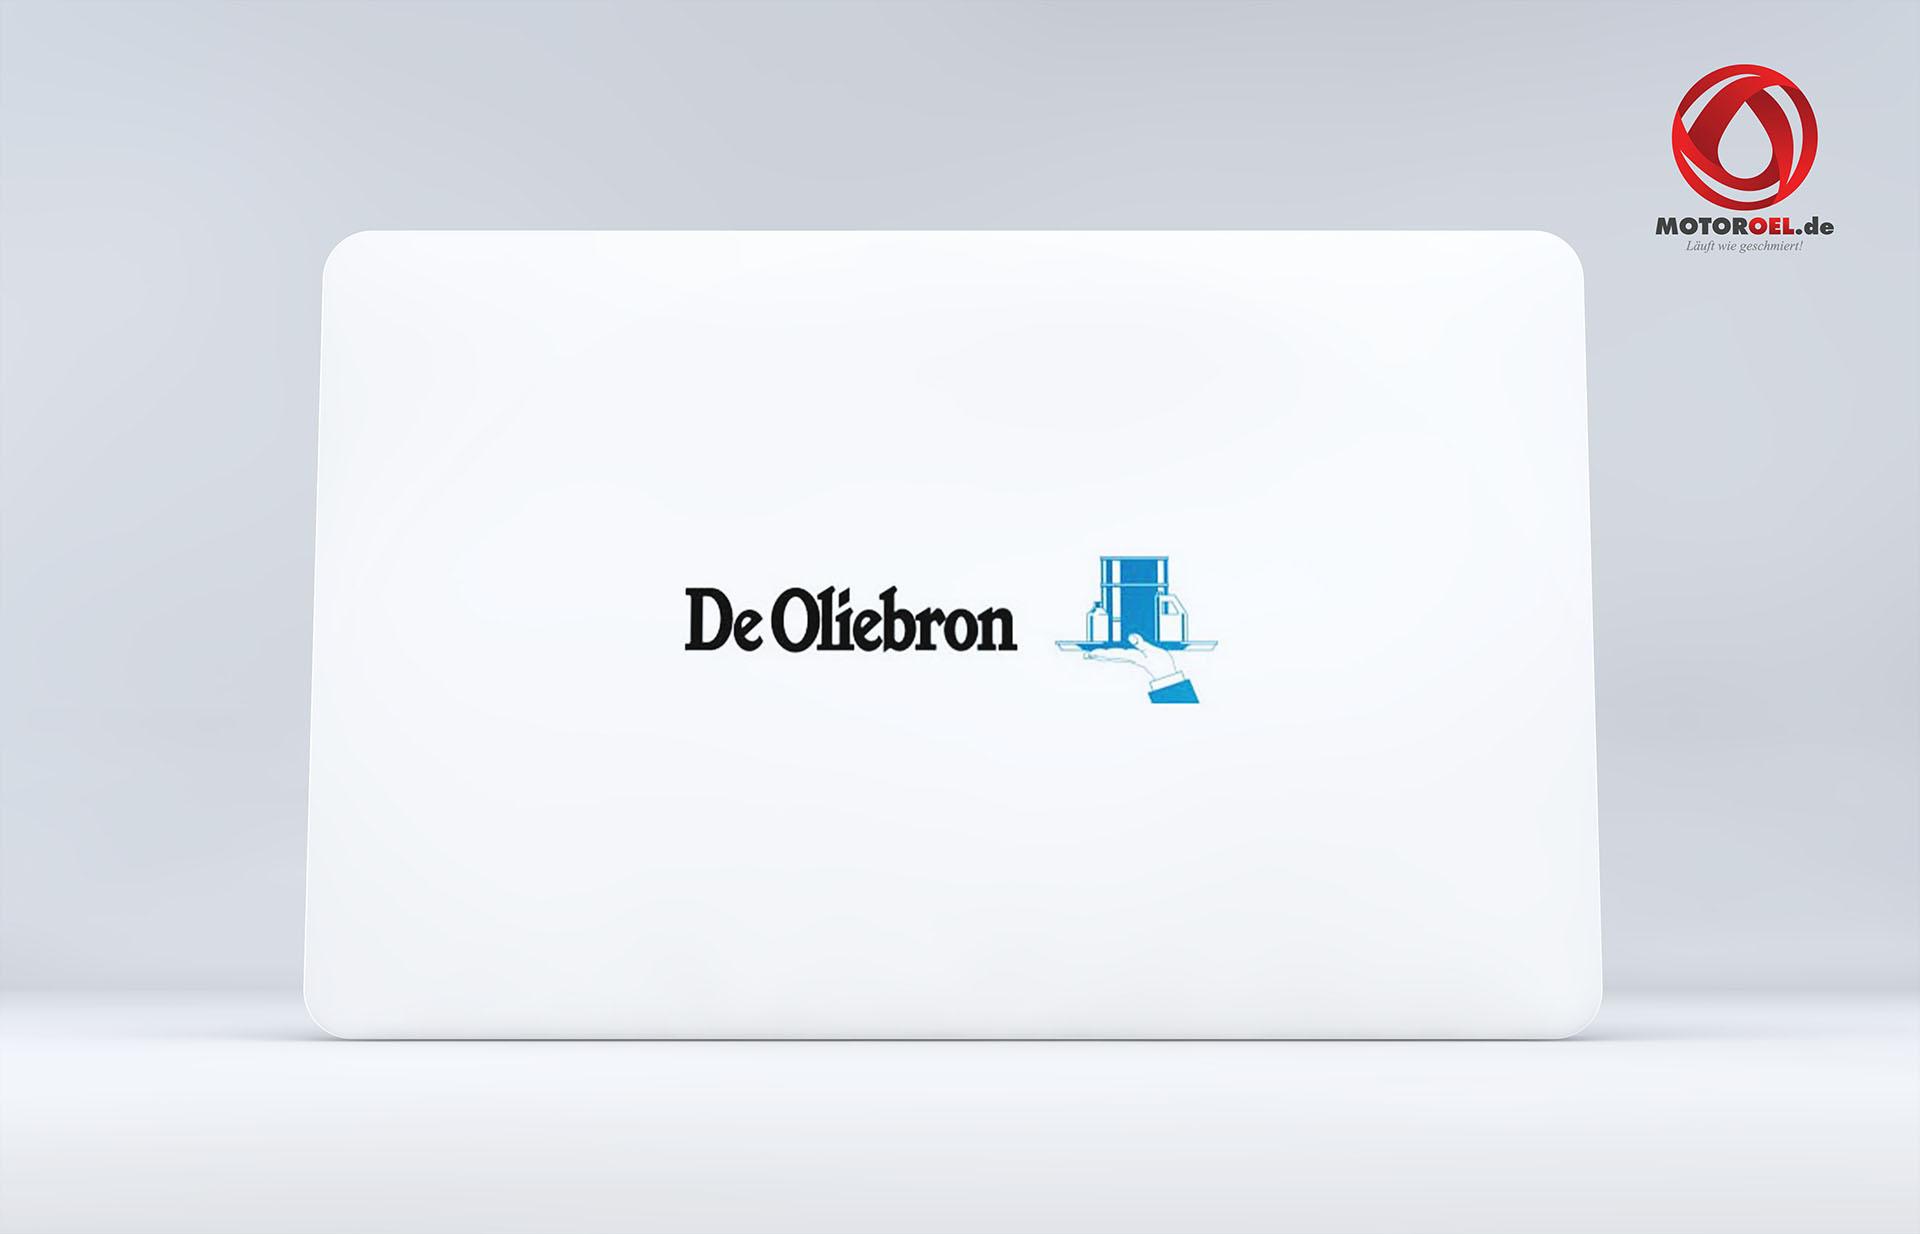 De Oilebron Motoröl Hersteller